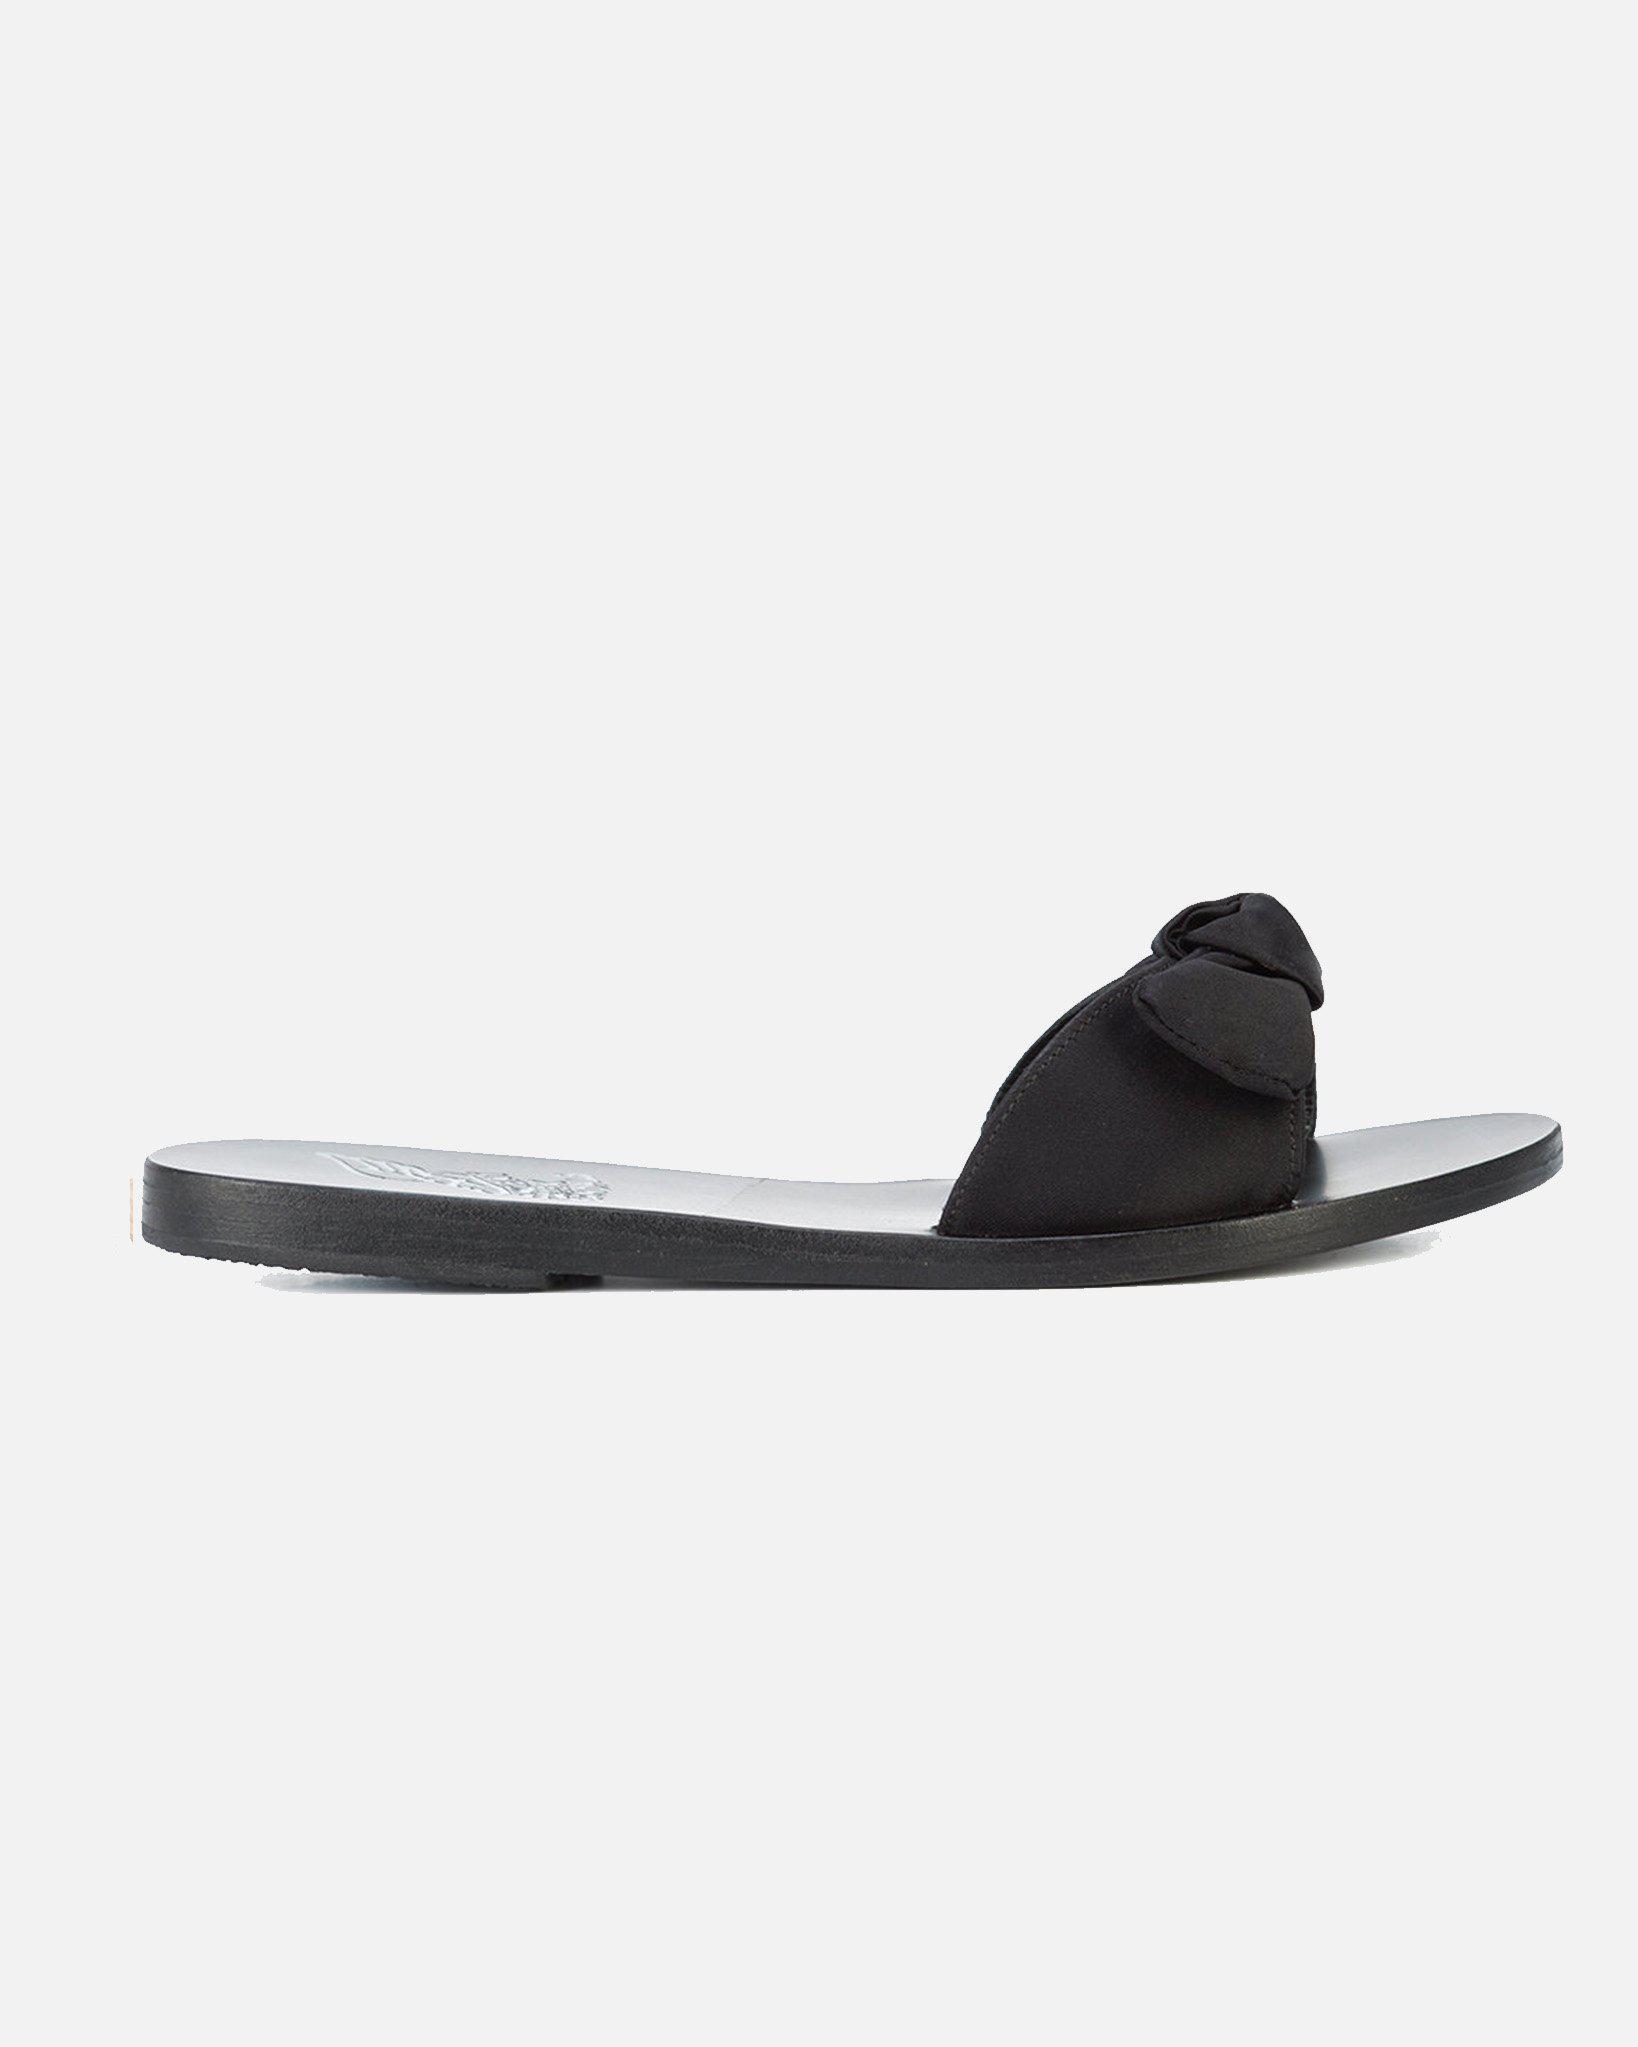 Ancient Greek Sandals Alki slip-on sandals cheap sale lowest price shop offer cheap online popular tivmv0K7zr